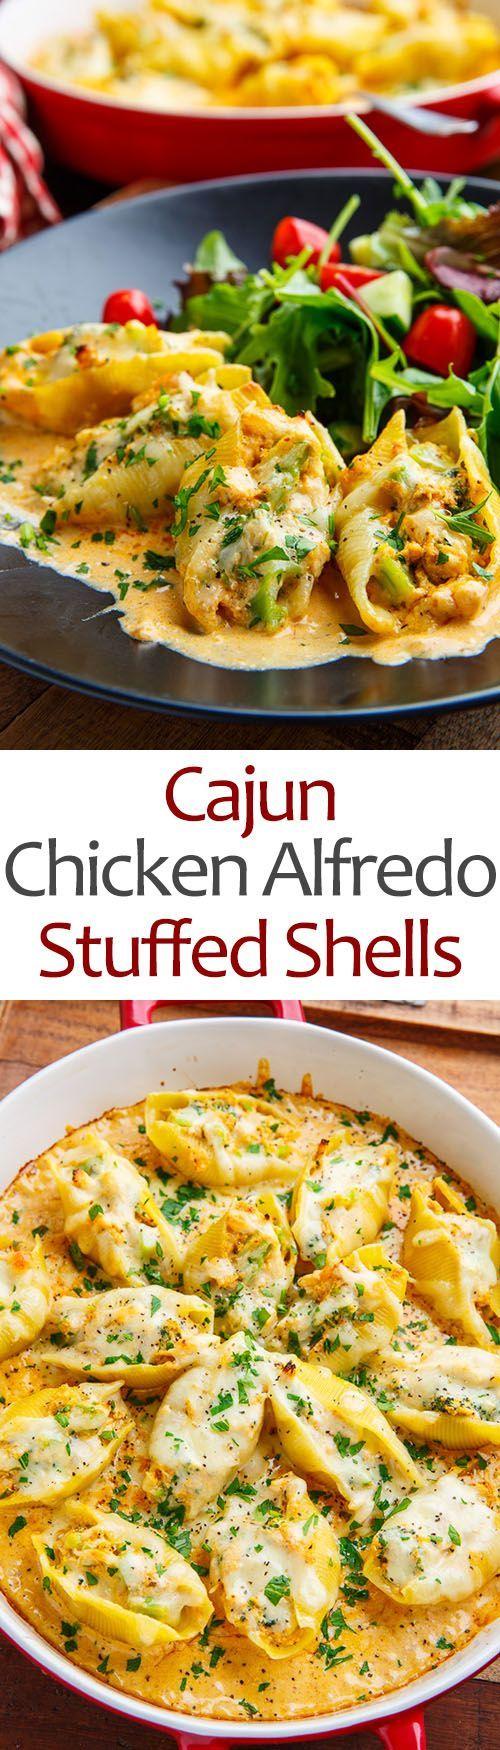 Cajun Chicken Alfredo Stuffed Shells